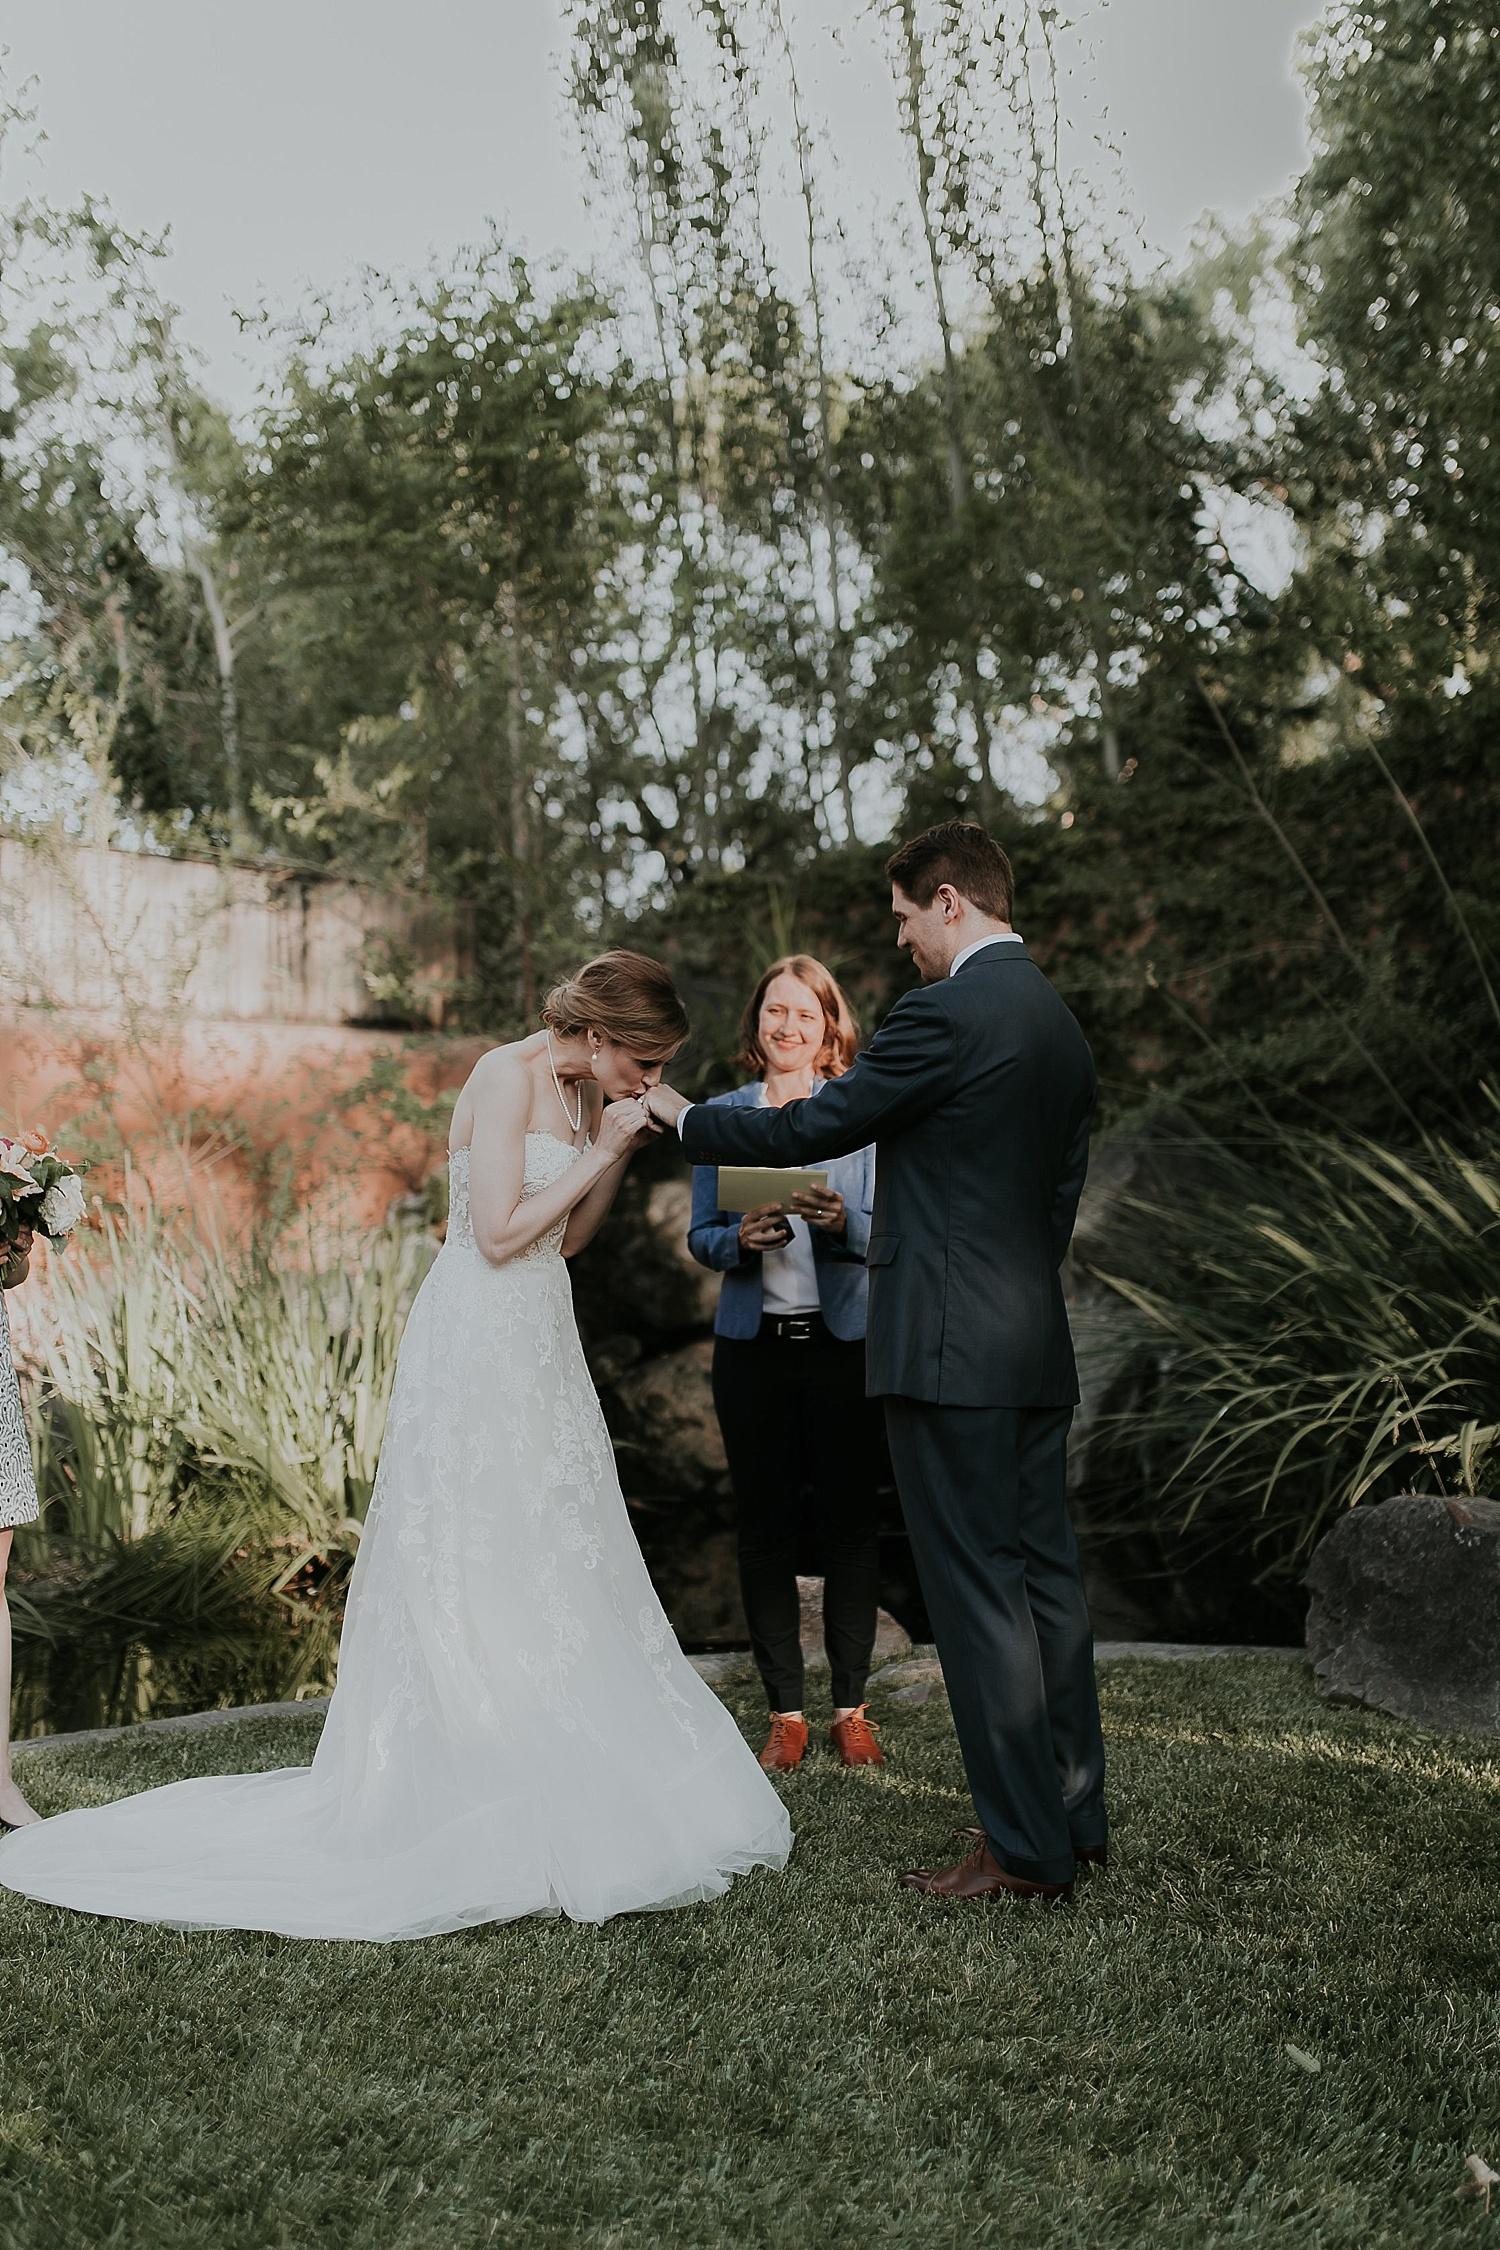 Alicia+lucia+photography+-+albuquerque+wedding+photographer+-+santa+fe+wedding+photography+-+new+mexico+wedding+photographer+-+gerald+peters+gallery+wedding_0044.jpg